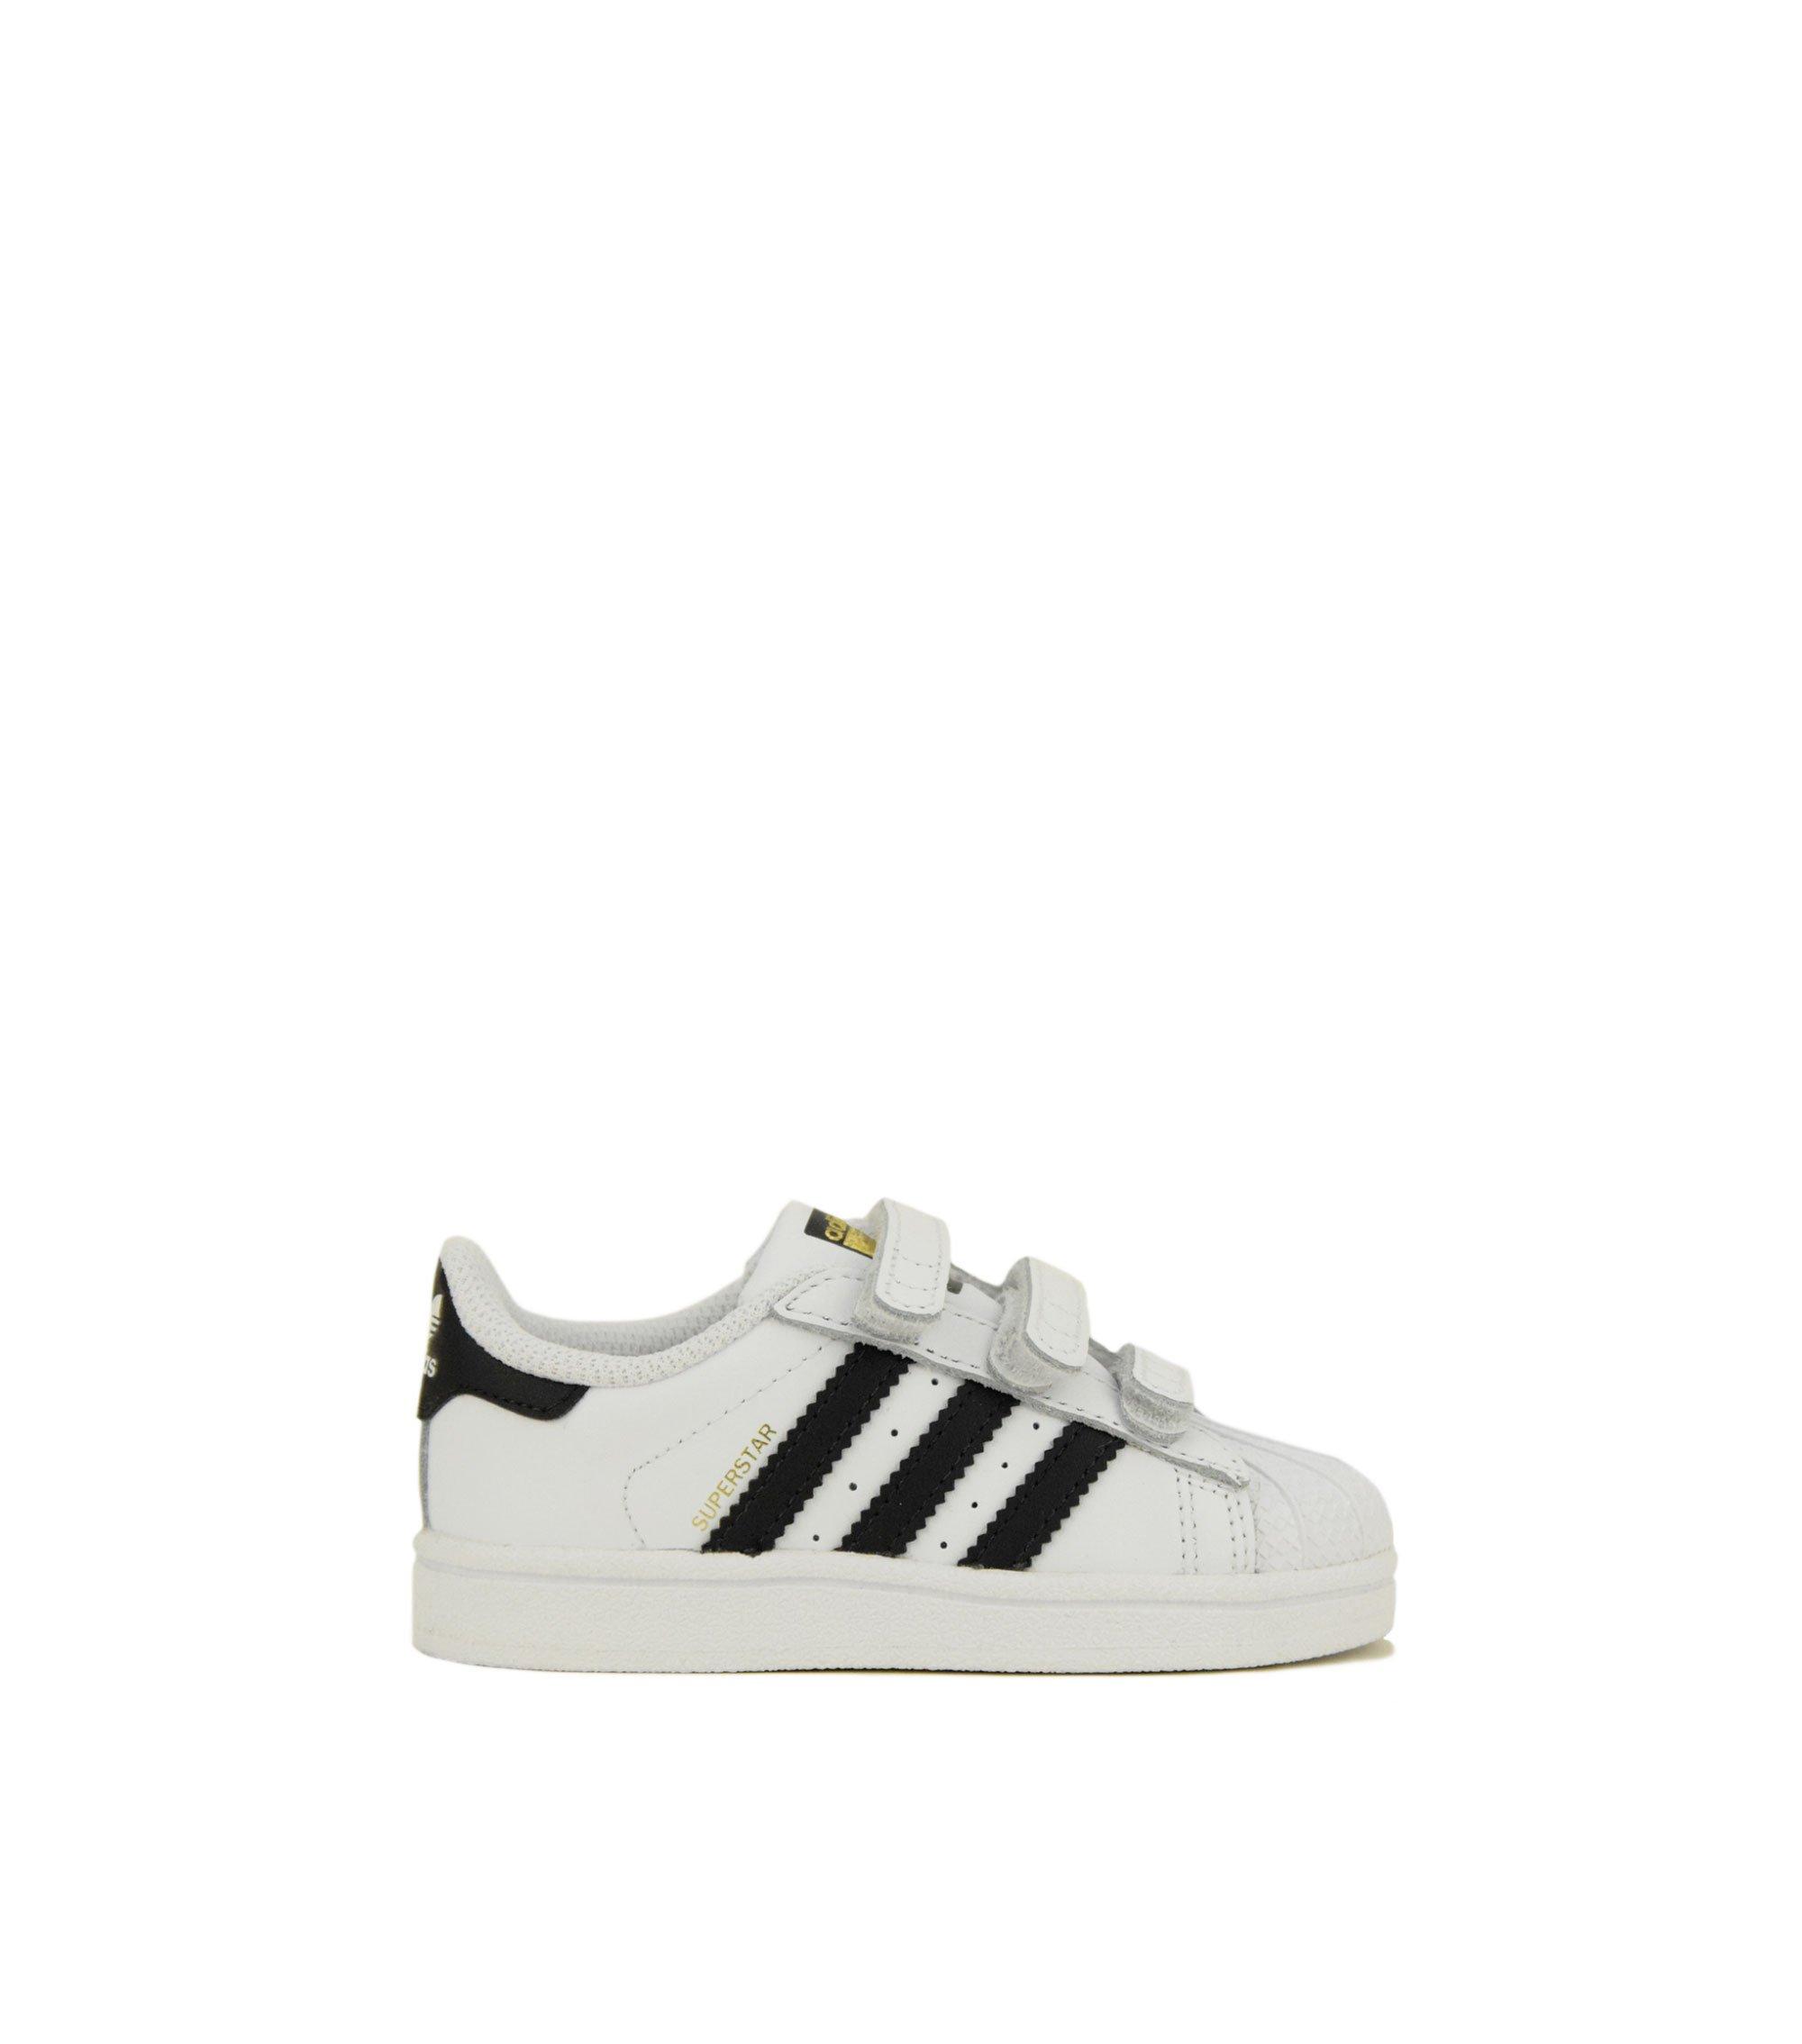 dc4abd64d84a7 Adidas Superstar CF I (BZ0418) Black White